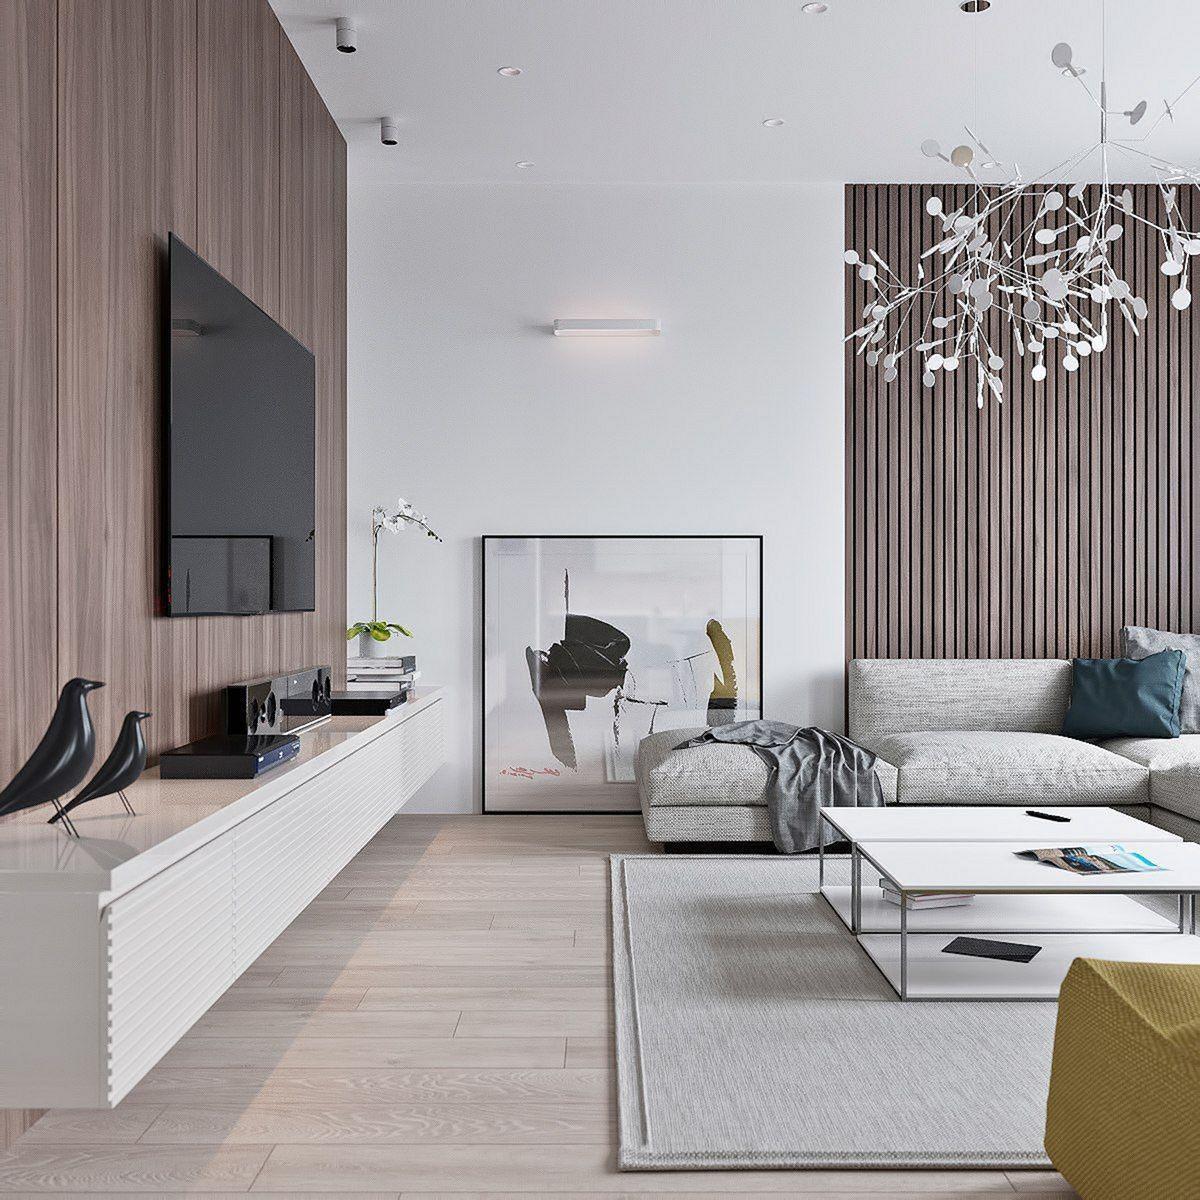 10 Simple Modern Living Room Decoration Ideas That Look More Amaze Liv In 2020 Scandinavian Design Living Room Modern Living Room Interior Living Room Design Modern